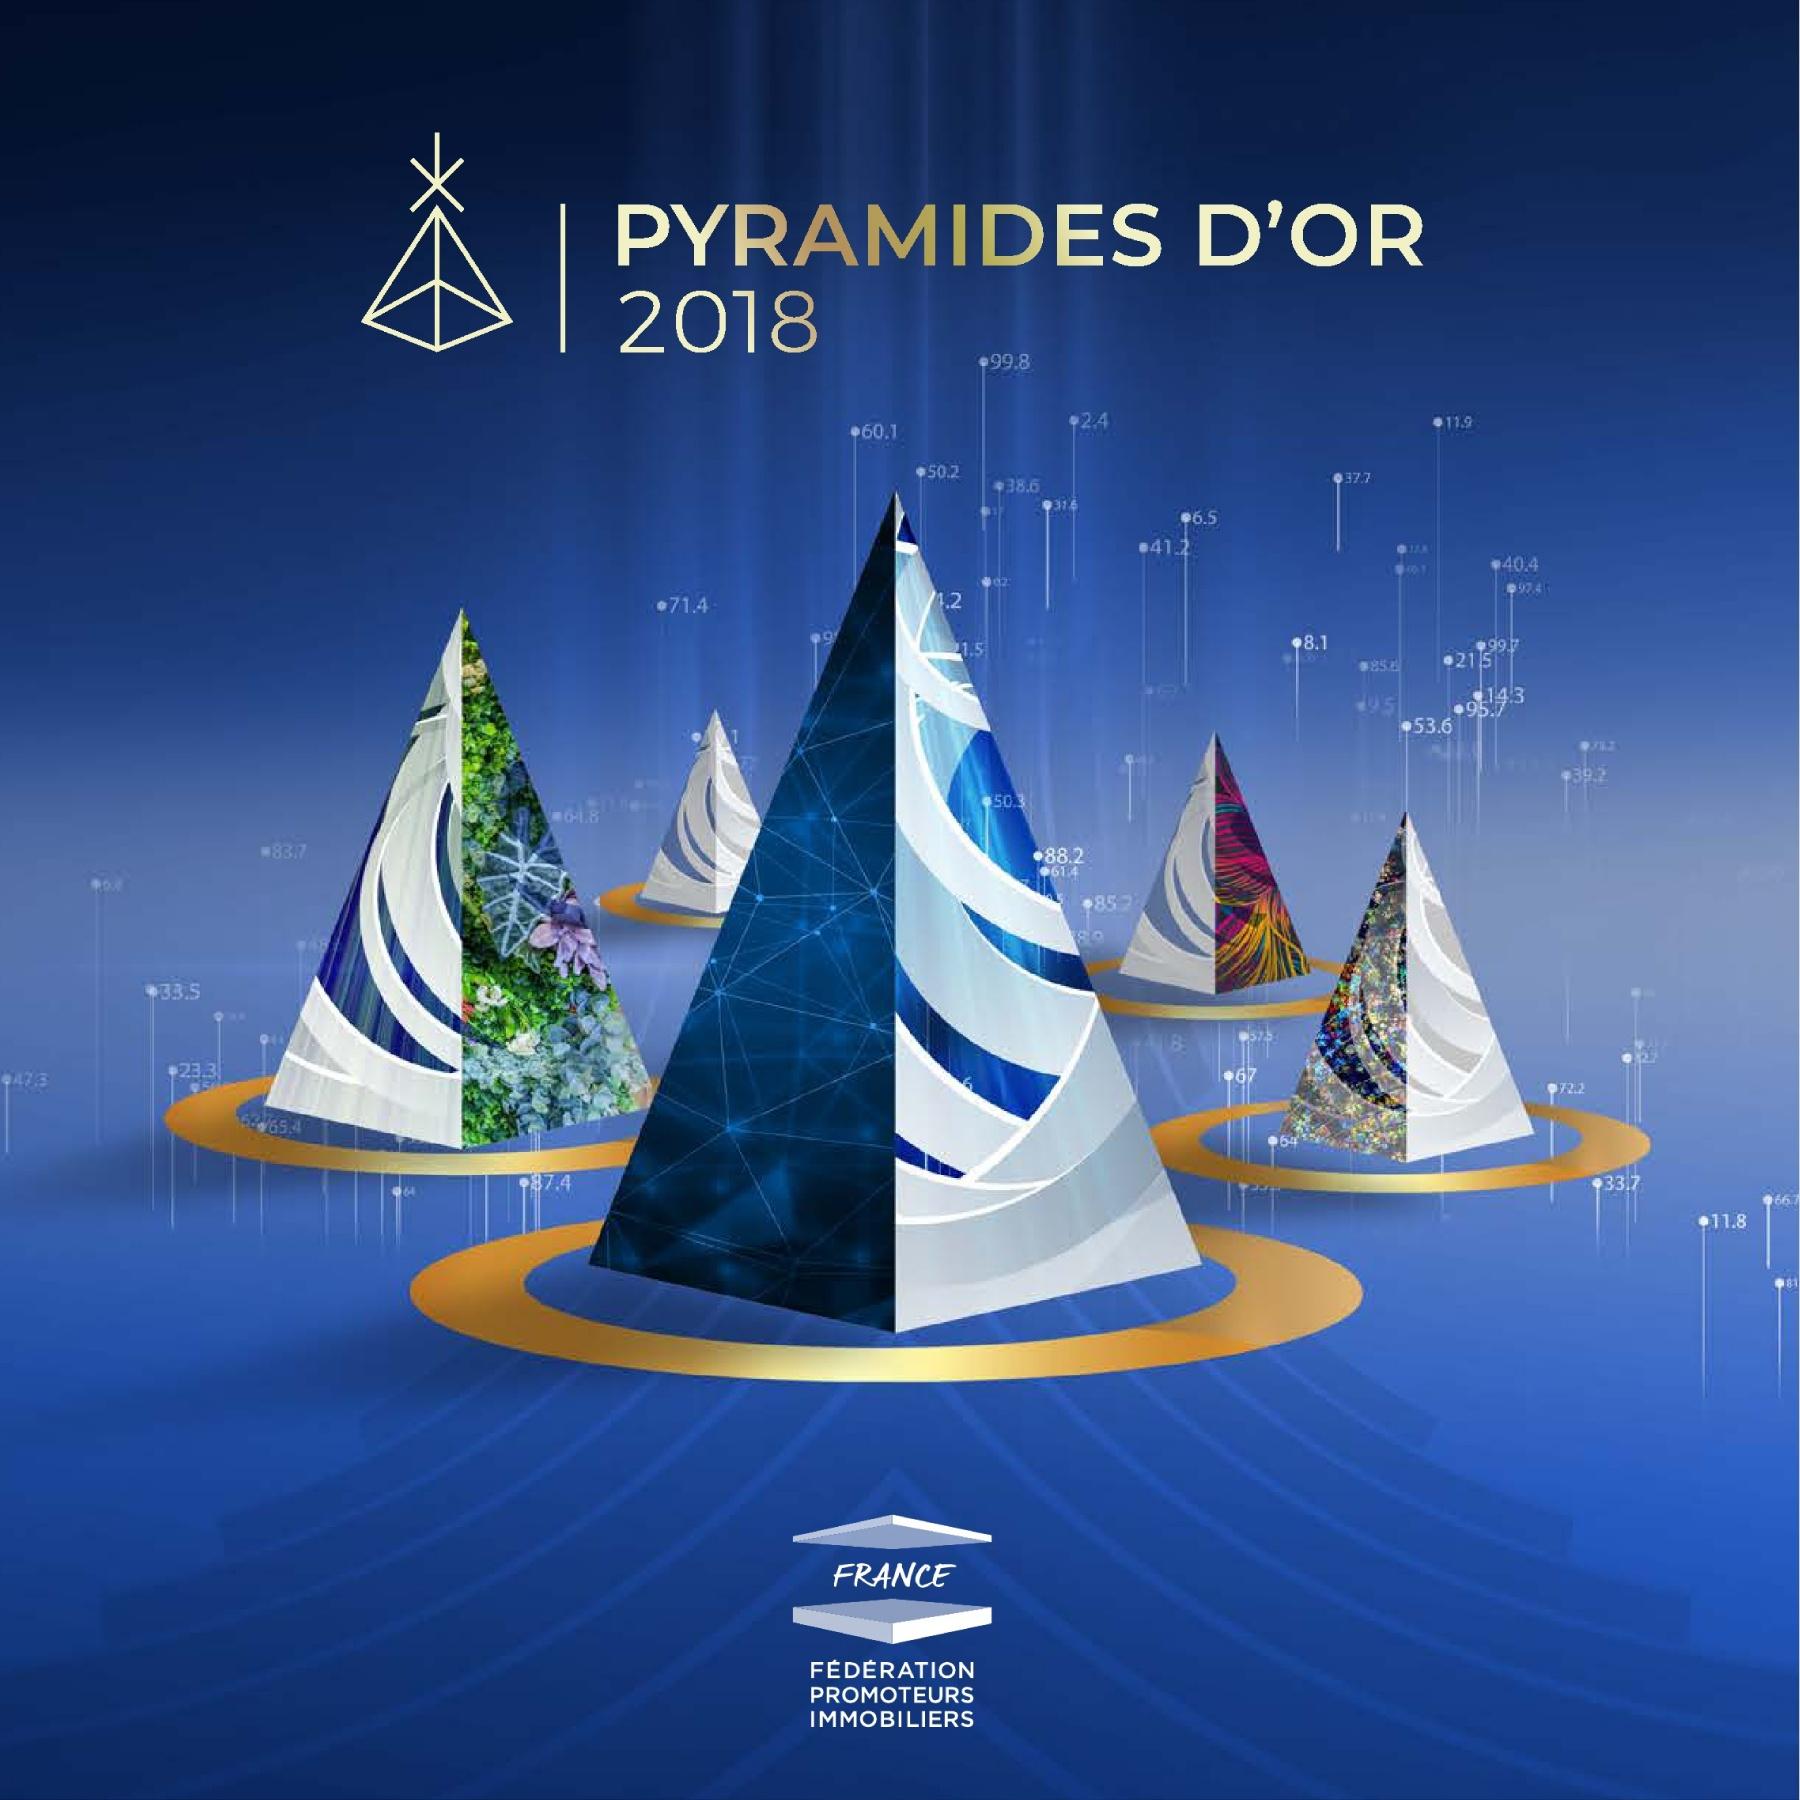 Pyramides or 2018